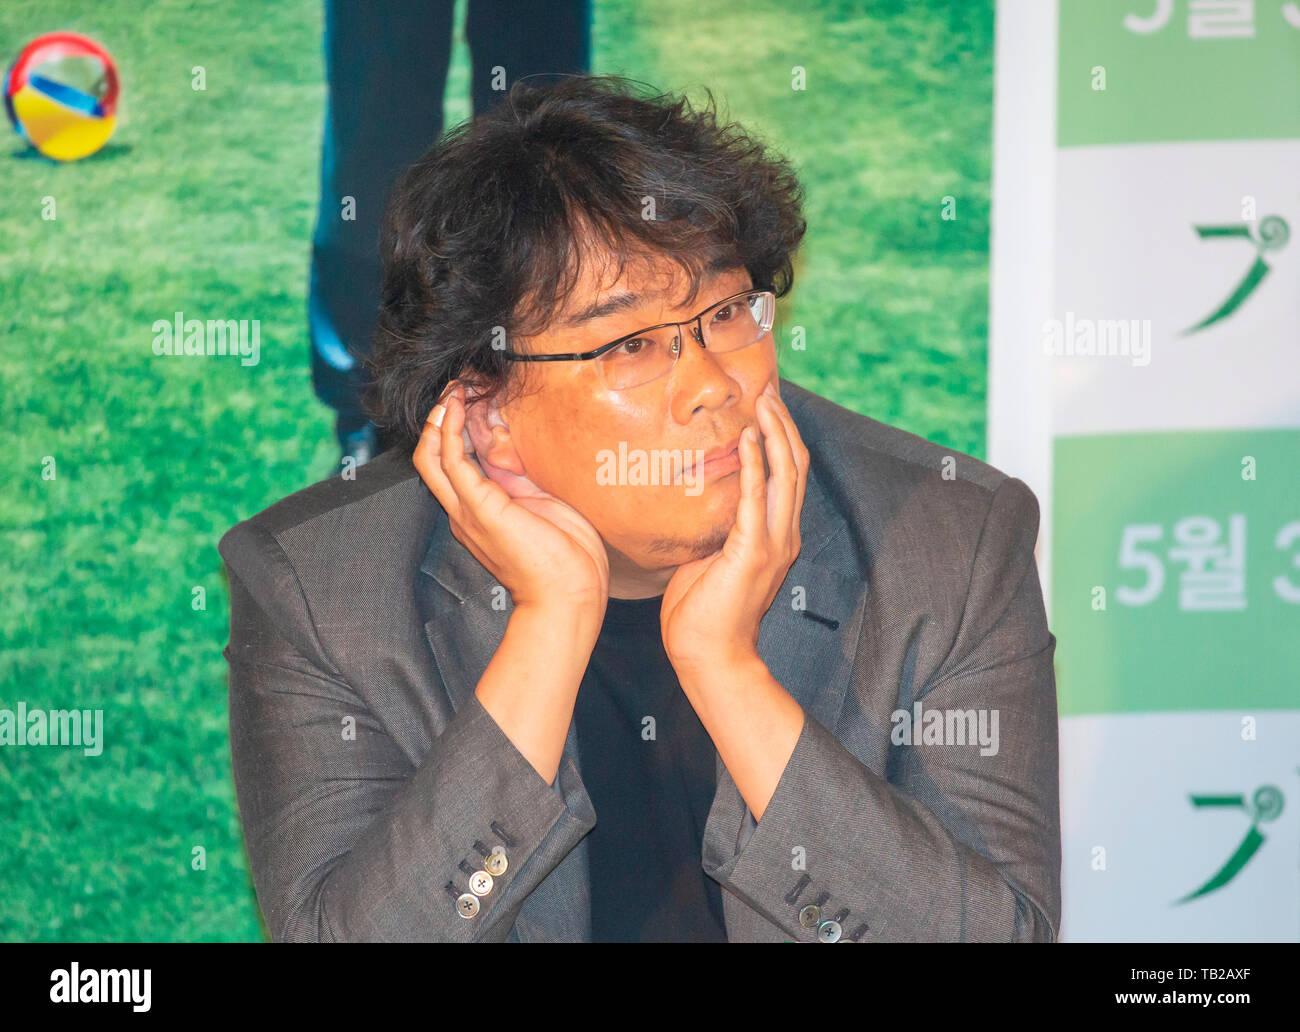 Bong Joon-Ho, May 28, 2019 : South Korean director Bong Joon-Ho